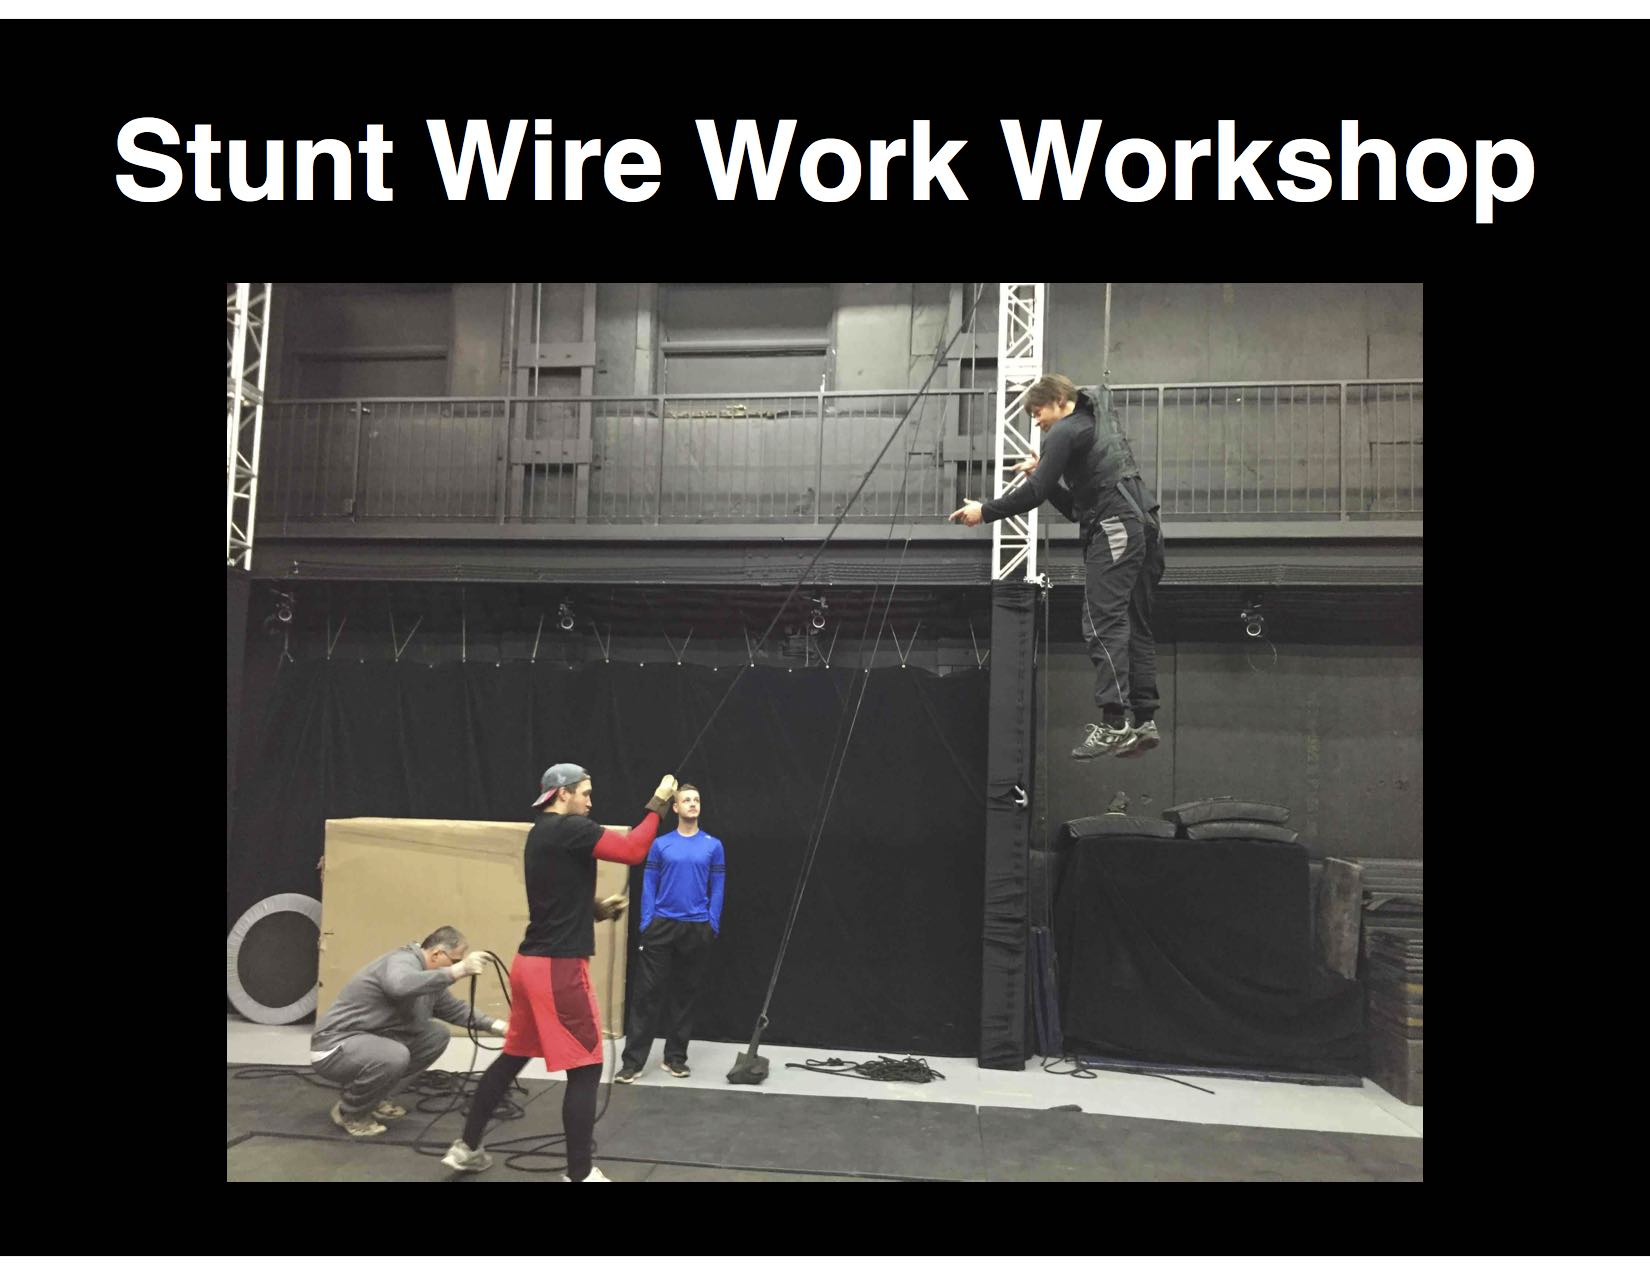 StuntWW-Workshop.jpg